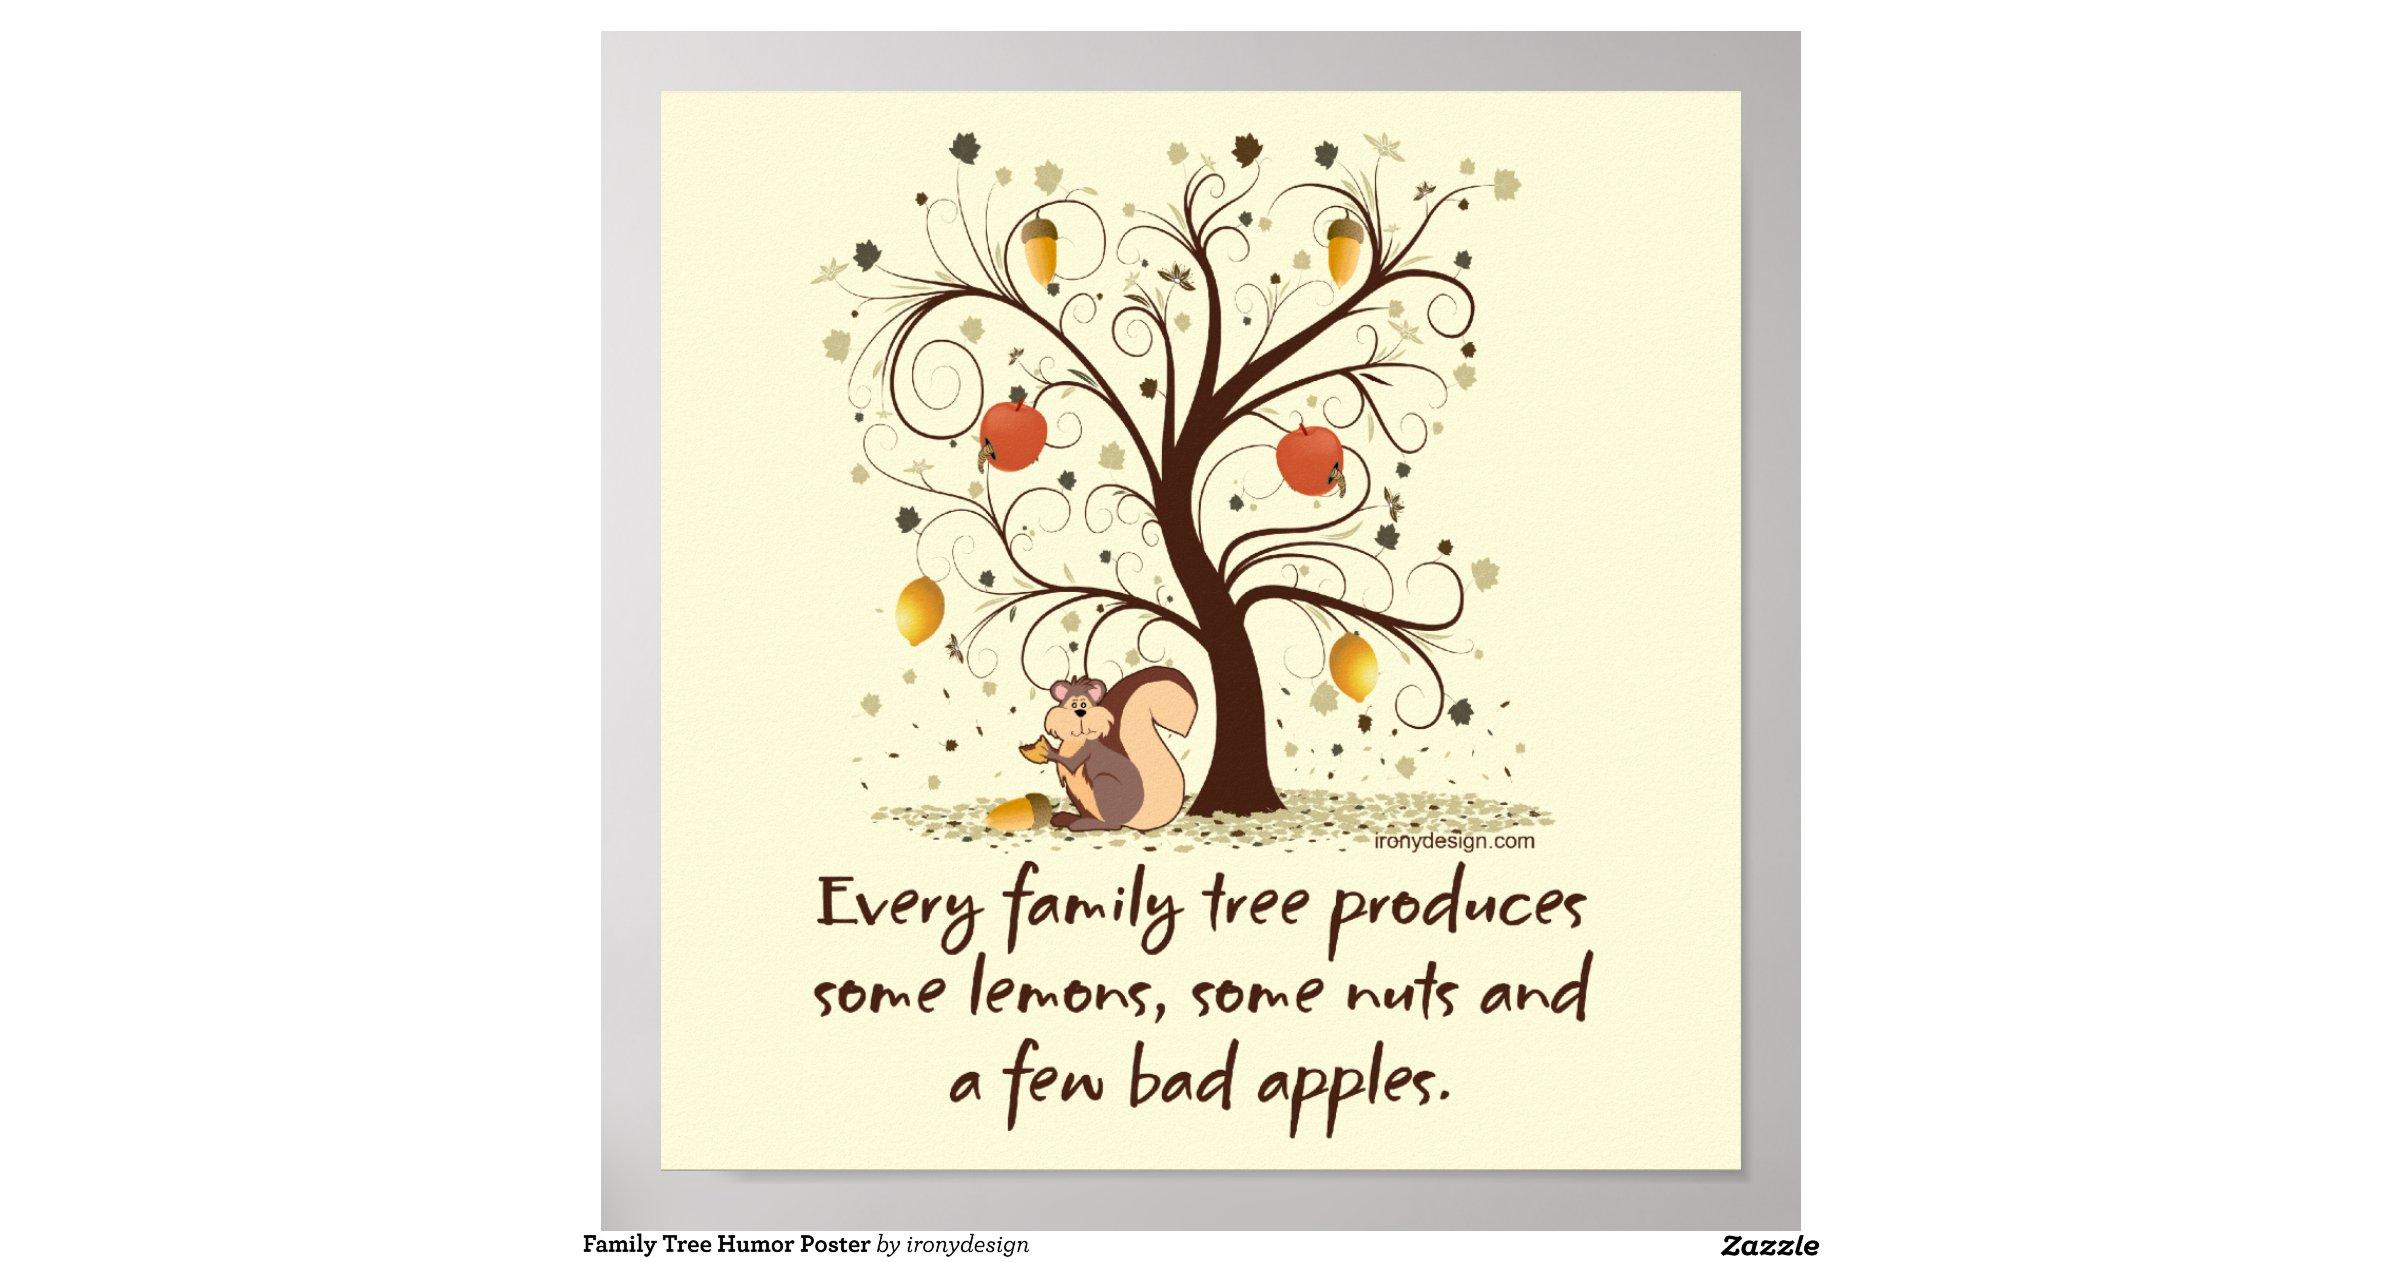 Family tree humor poster r ba ef fbc faea a